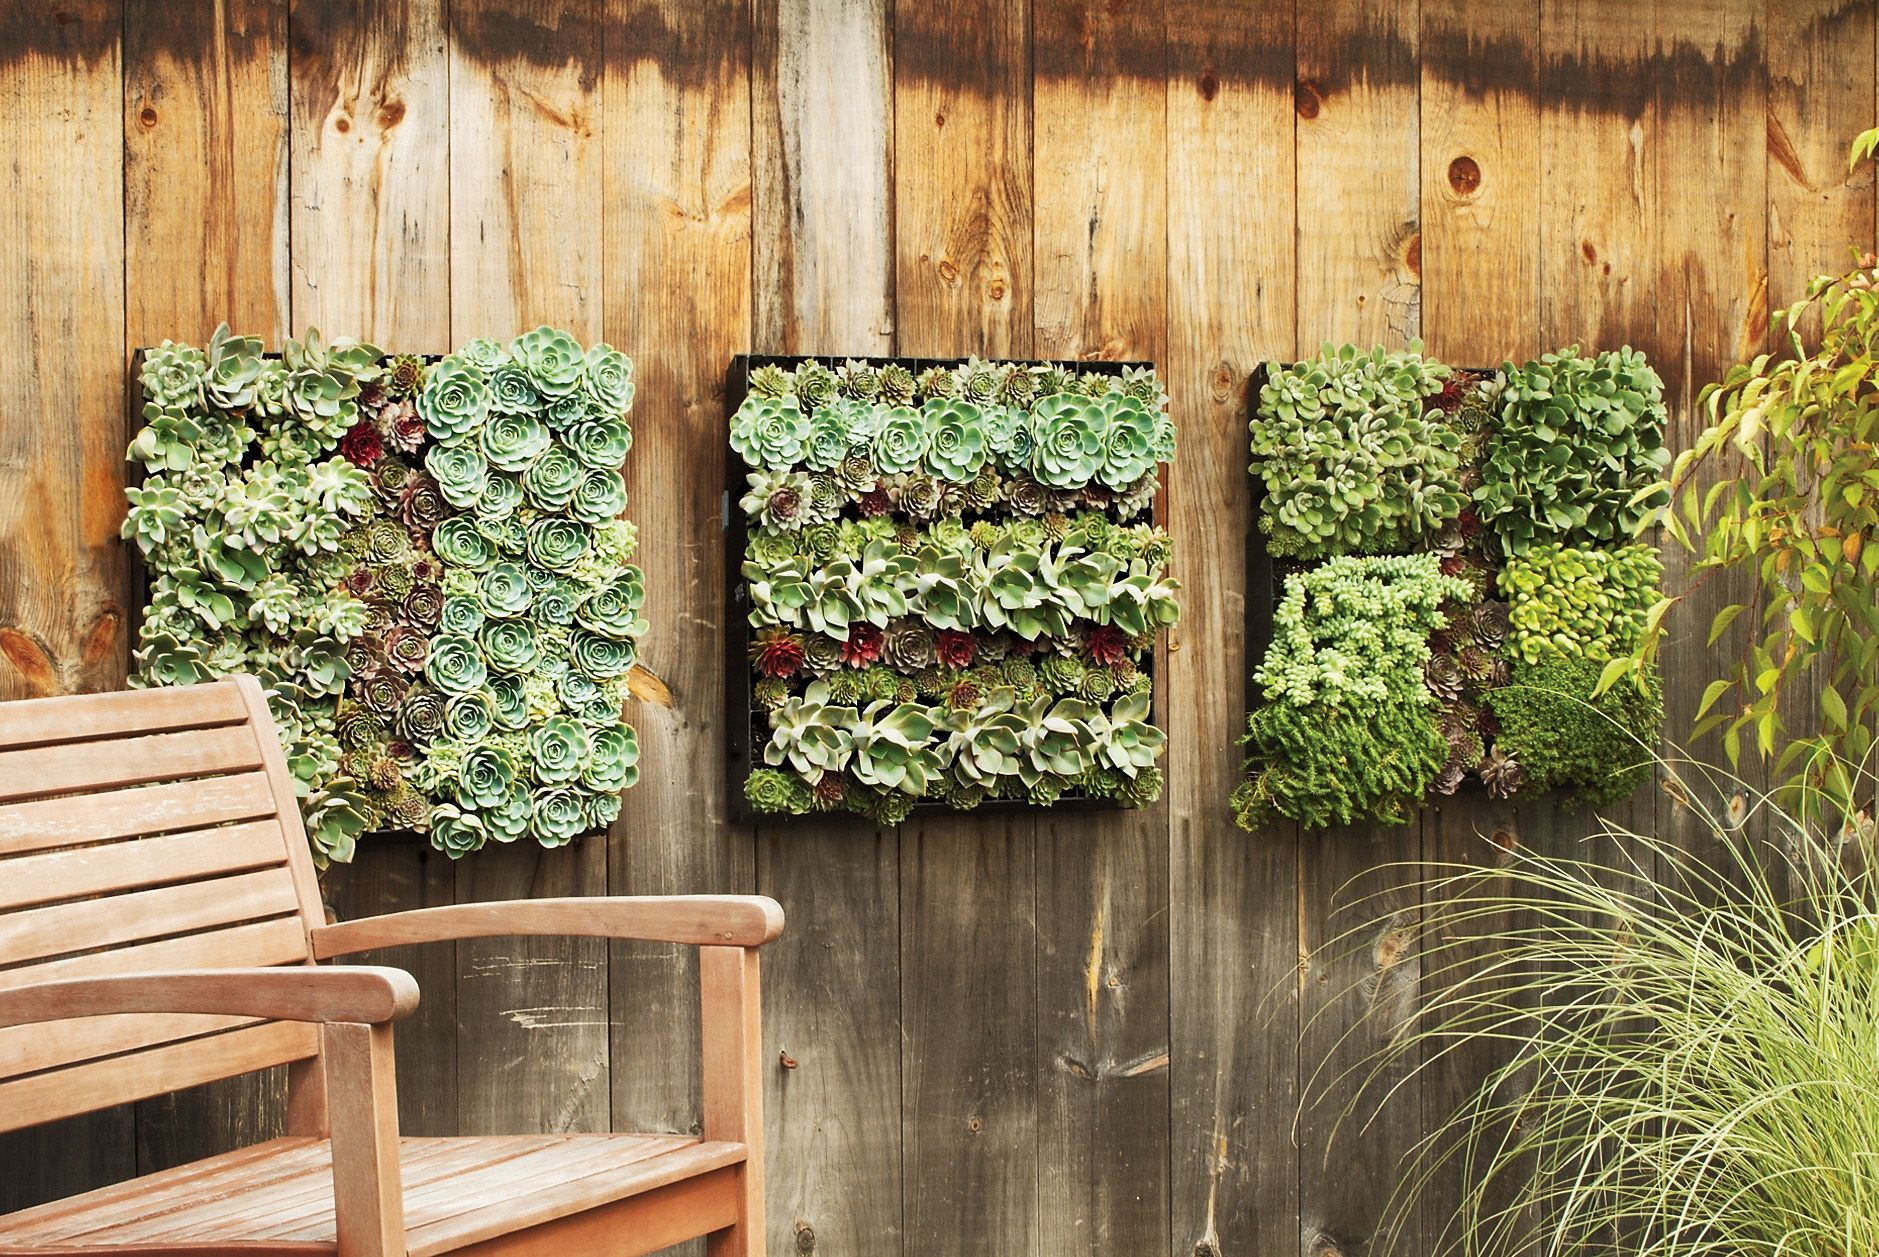 Outdoor Living Wall Panel Grid Living Wall Planter Fence Decor Backyard Fences